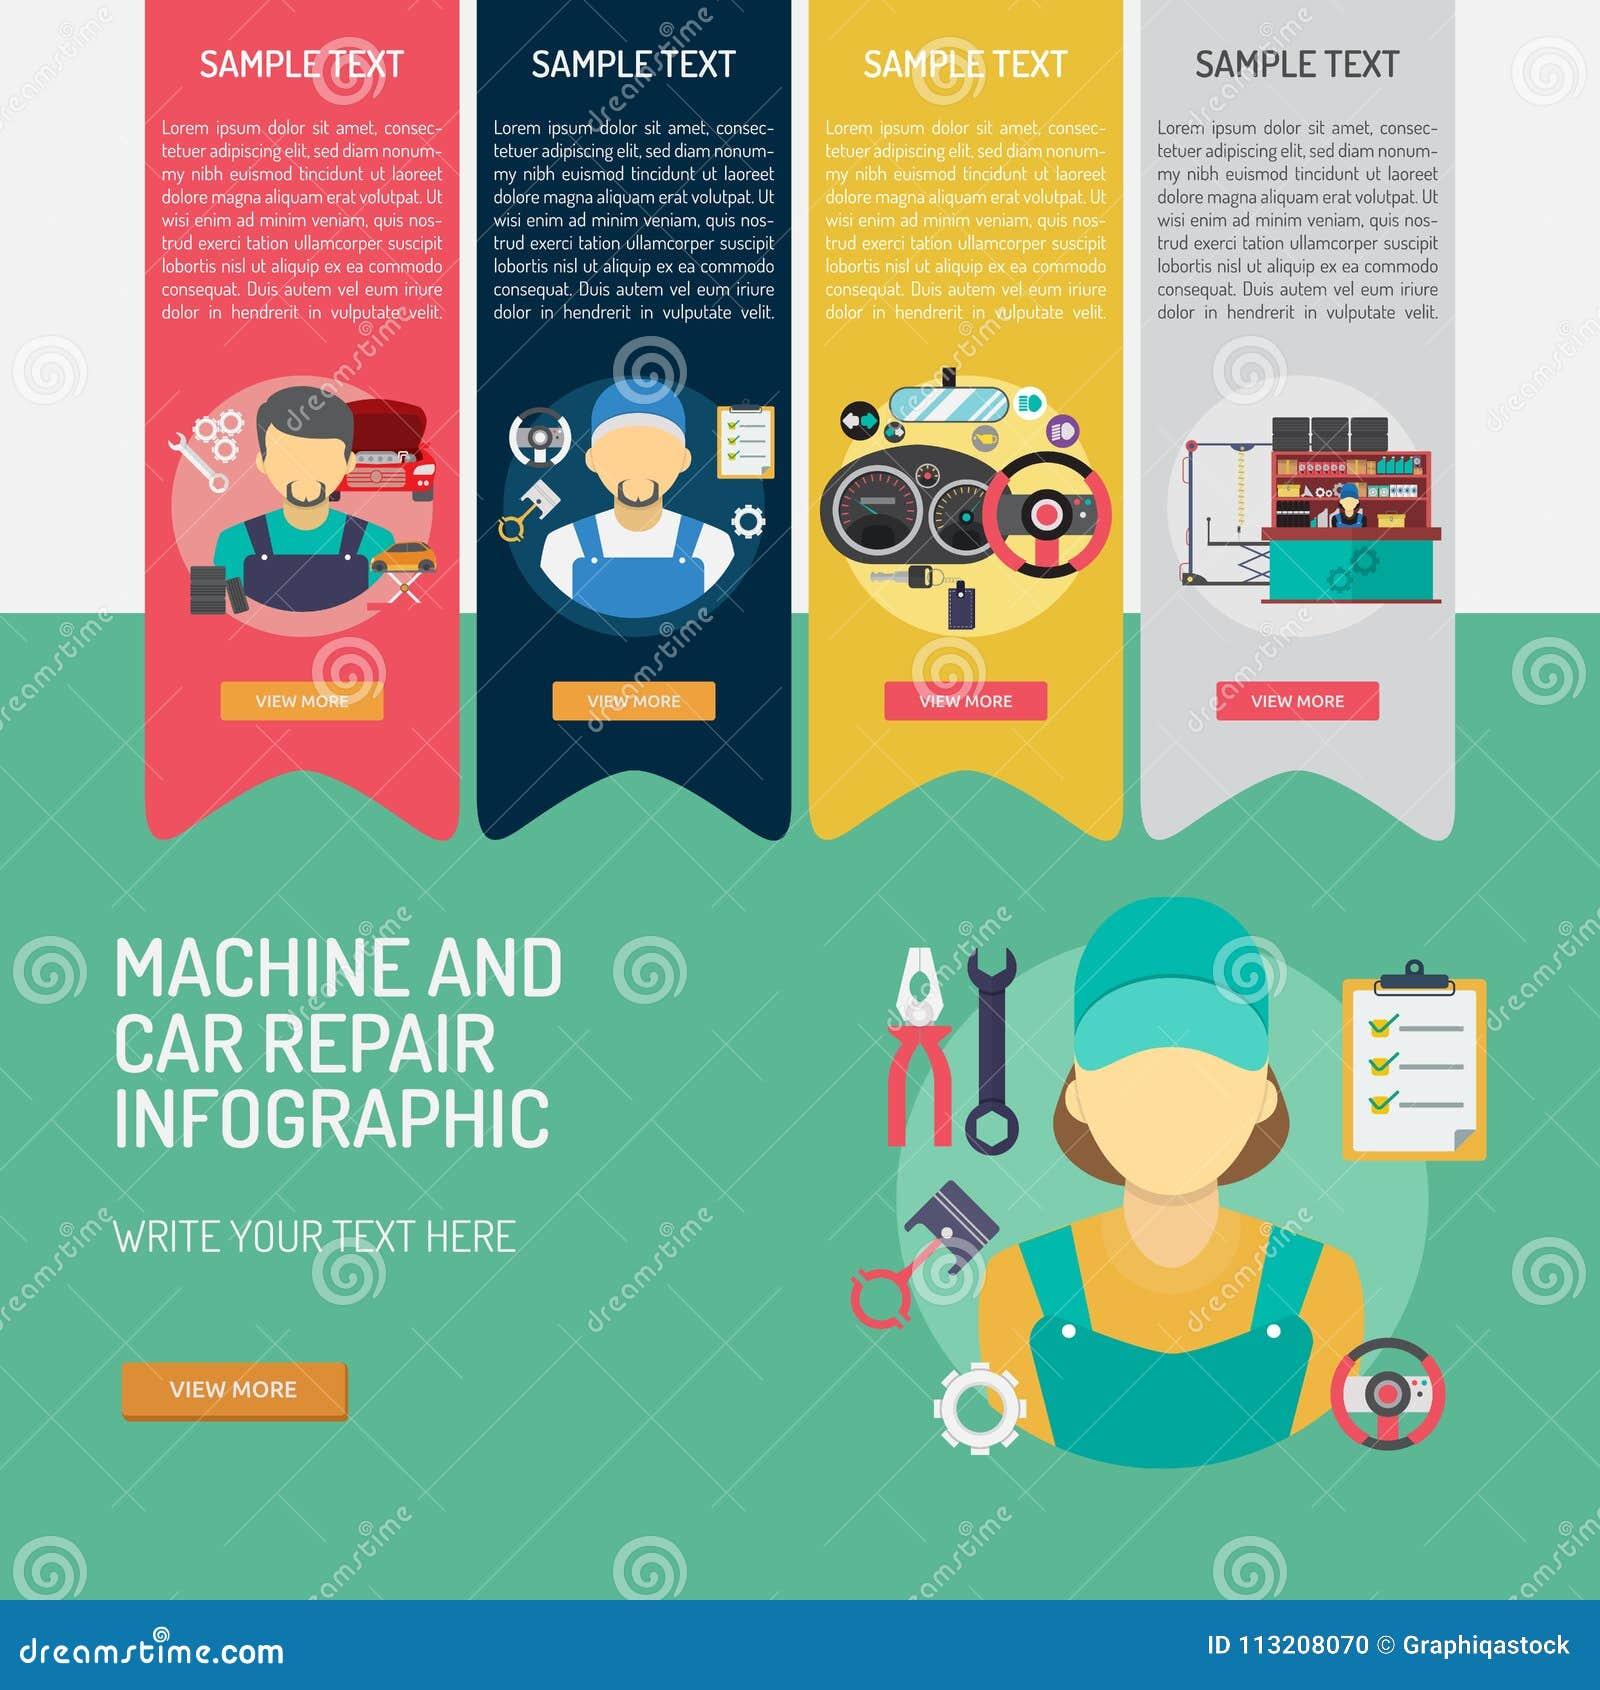 mechanic-car-repair-infographic-complex-